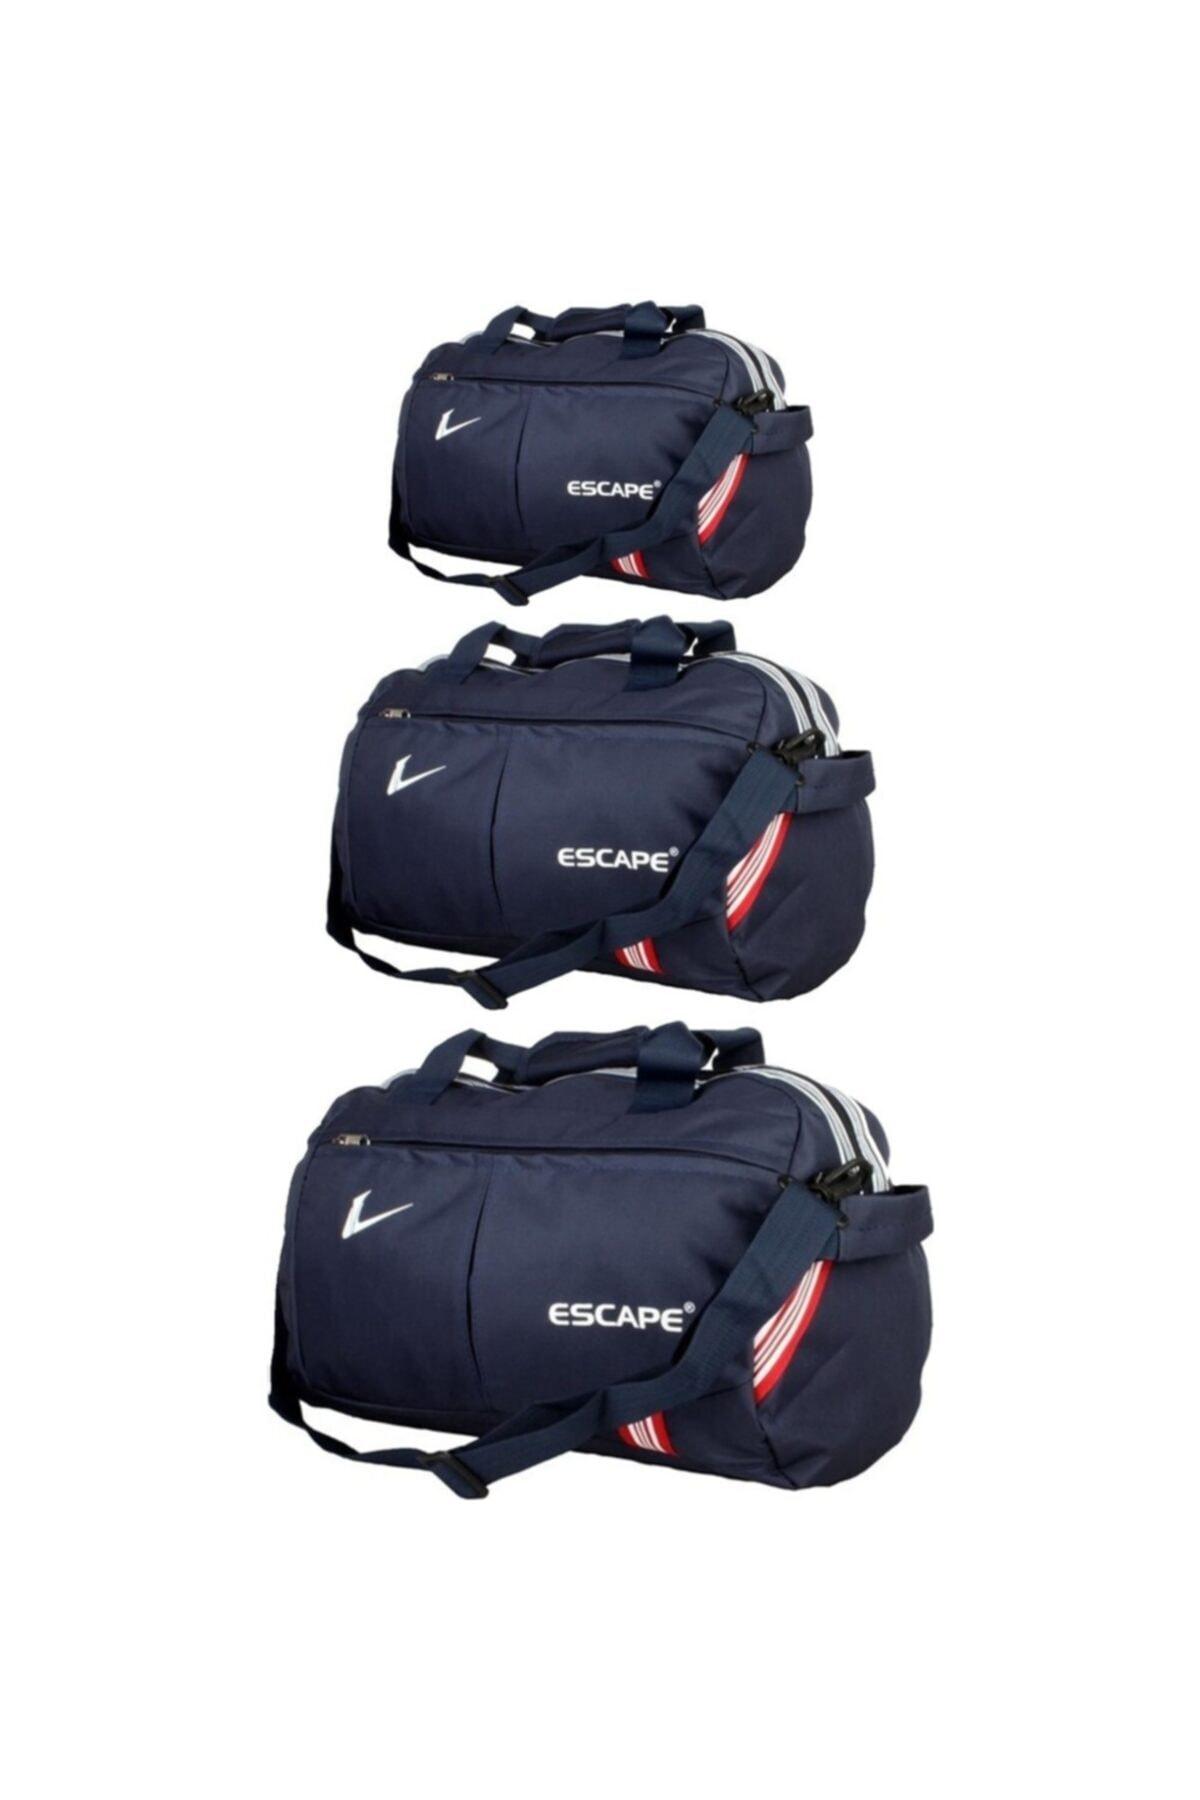 ESCAPE Spor Ve Seyahat Çantası3'lü Set 1